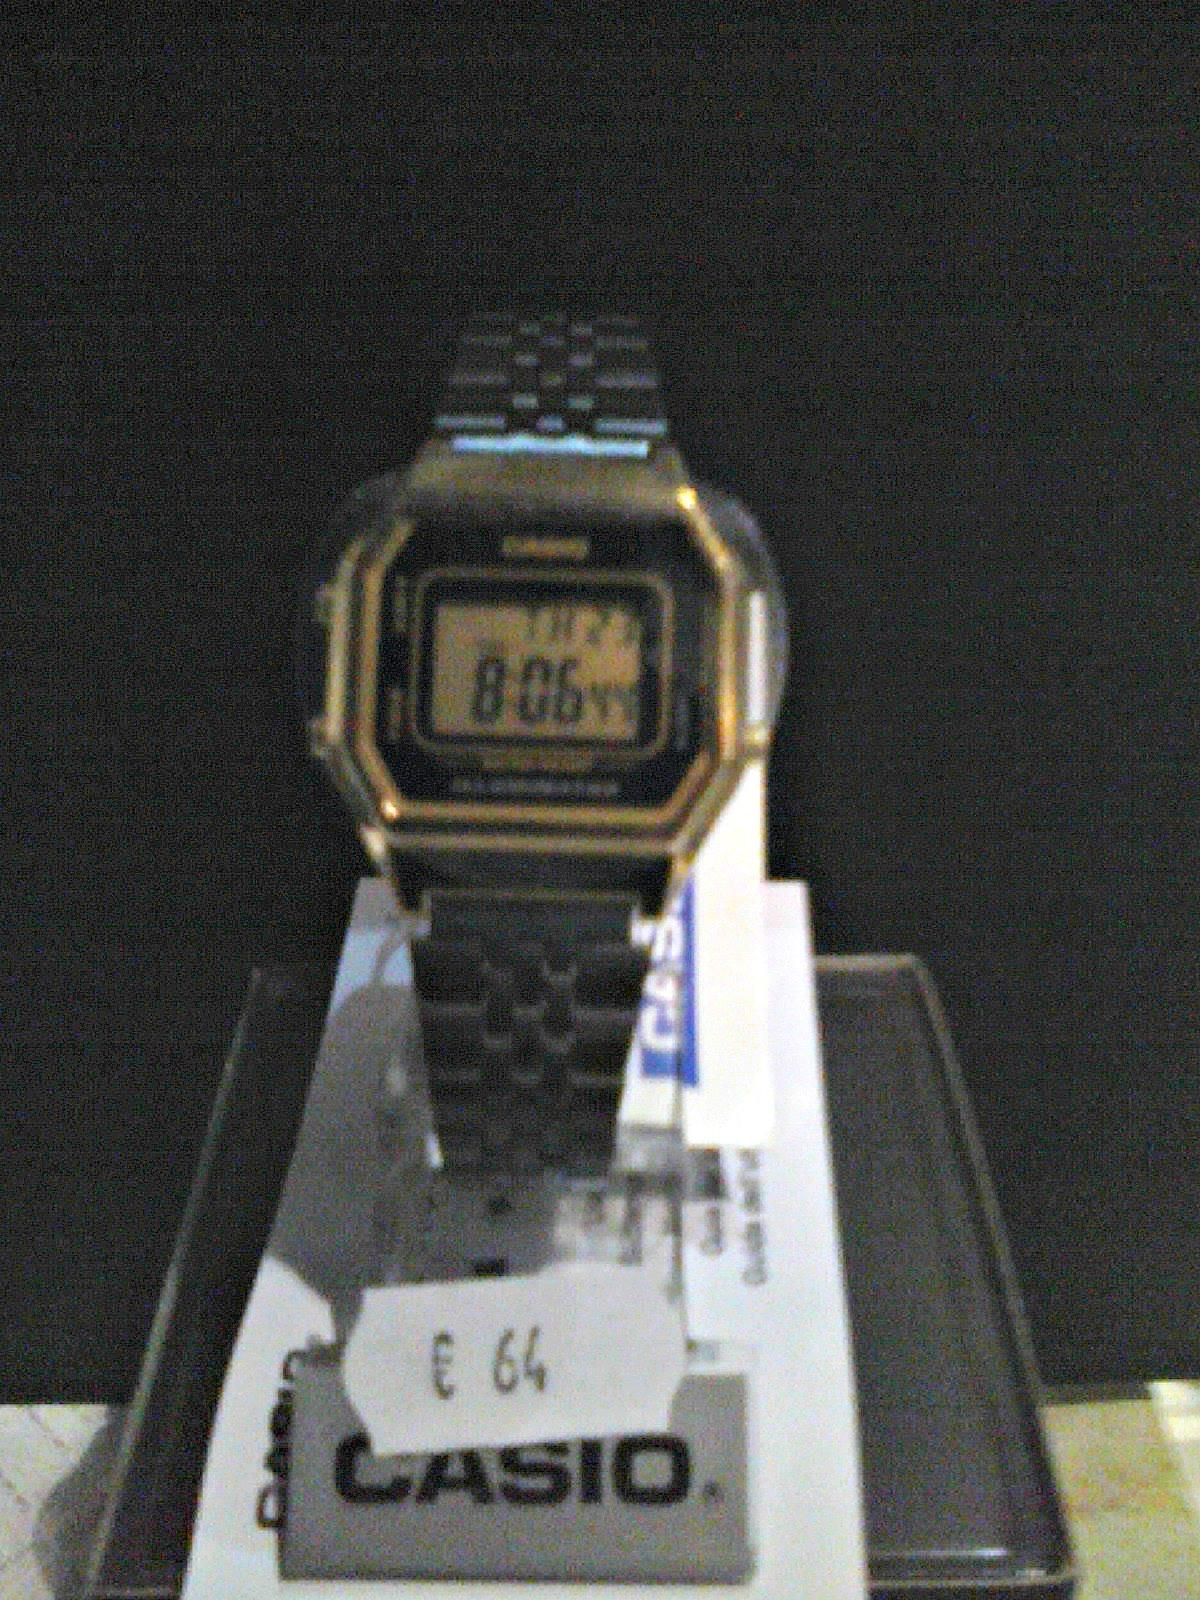 764ccc872ca5 ... Reloj Casio Mujer Ltp Acero Inoxidable Multifucion Relojes Pulsera  relojchicatamanocadetenegro